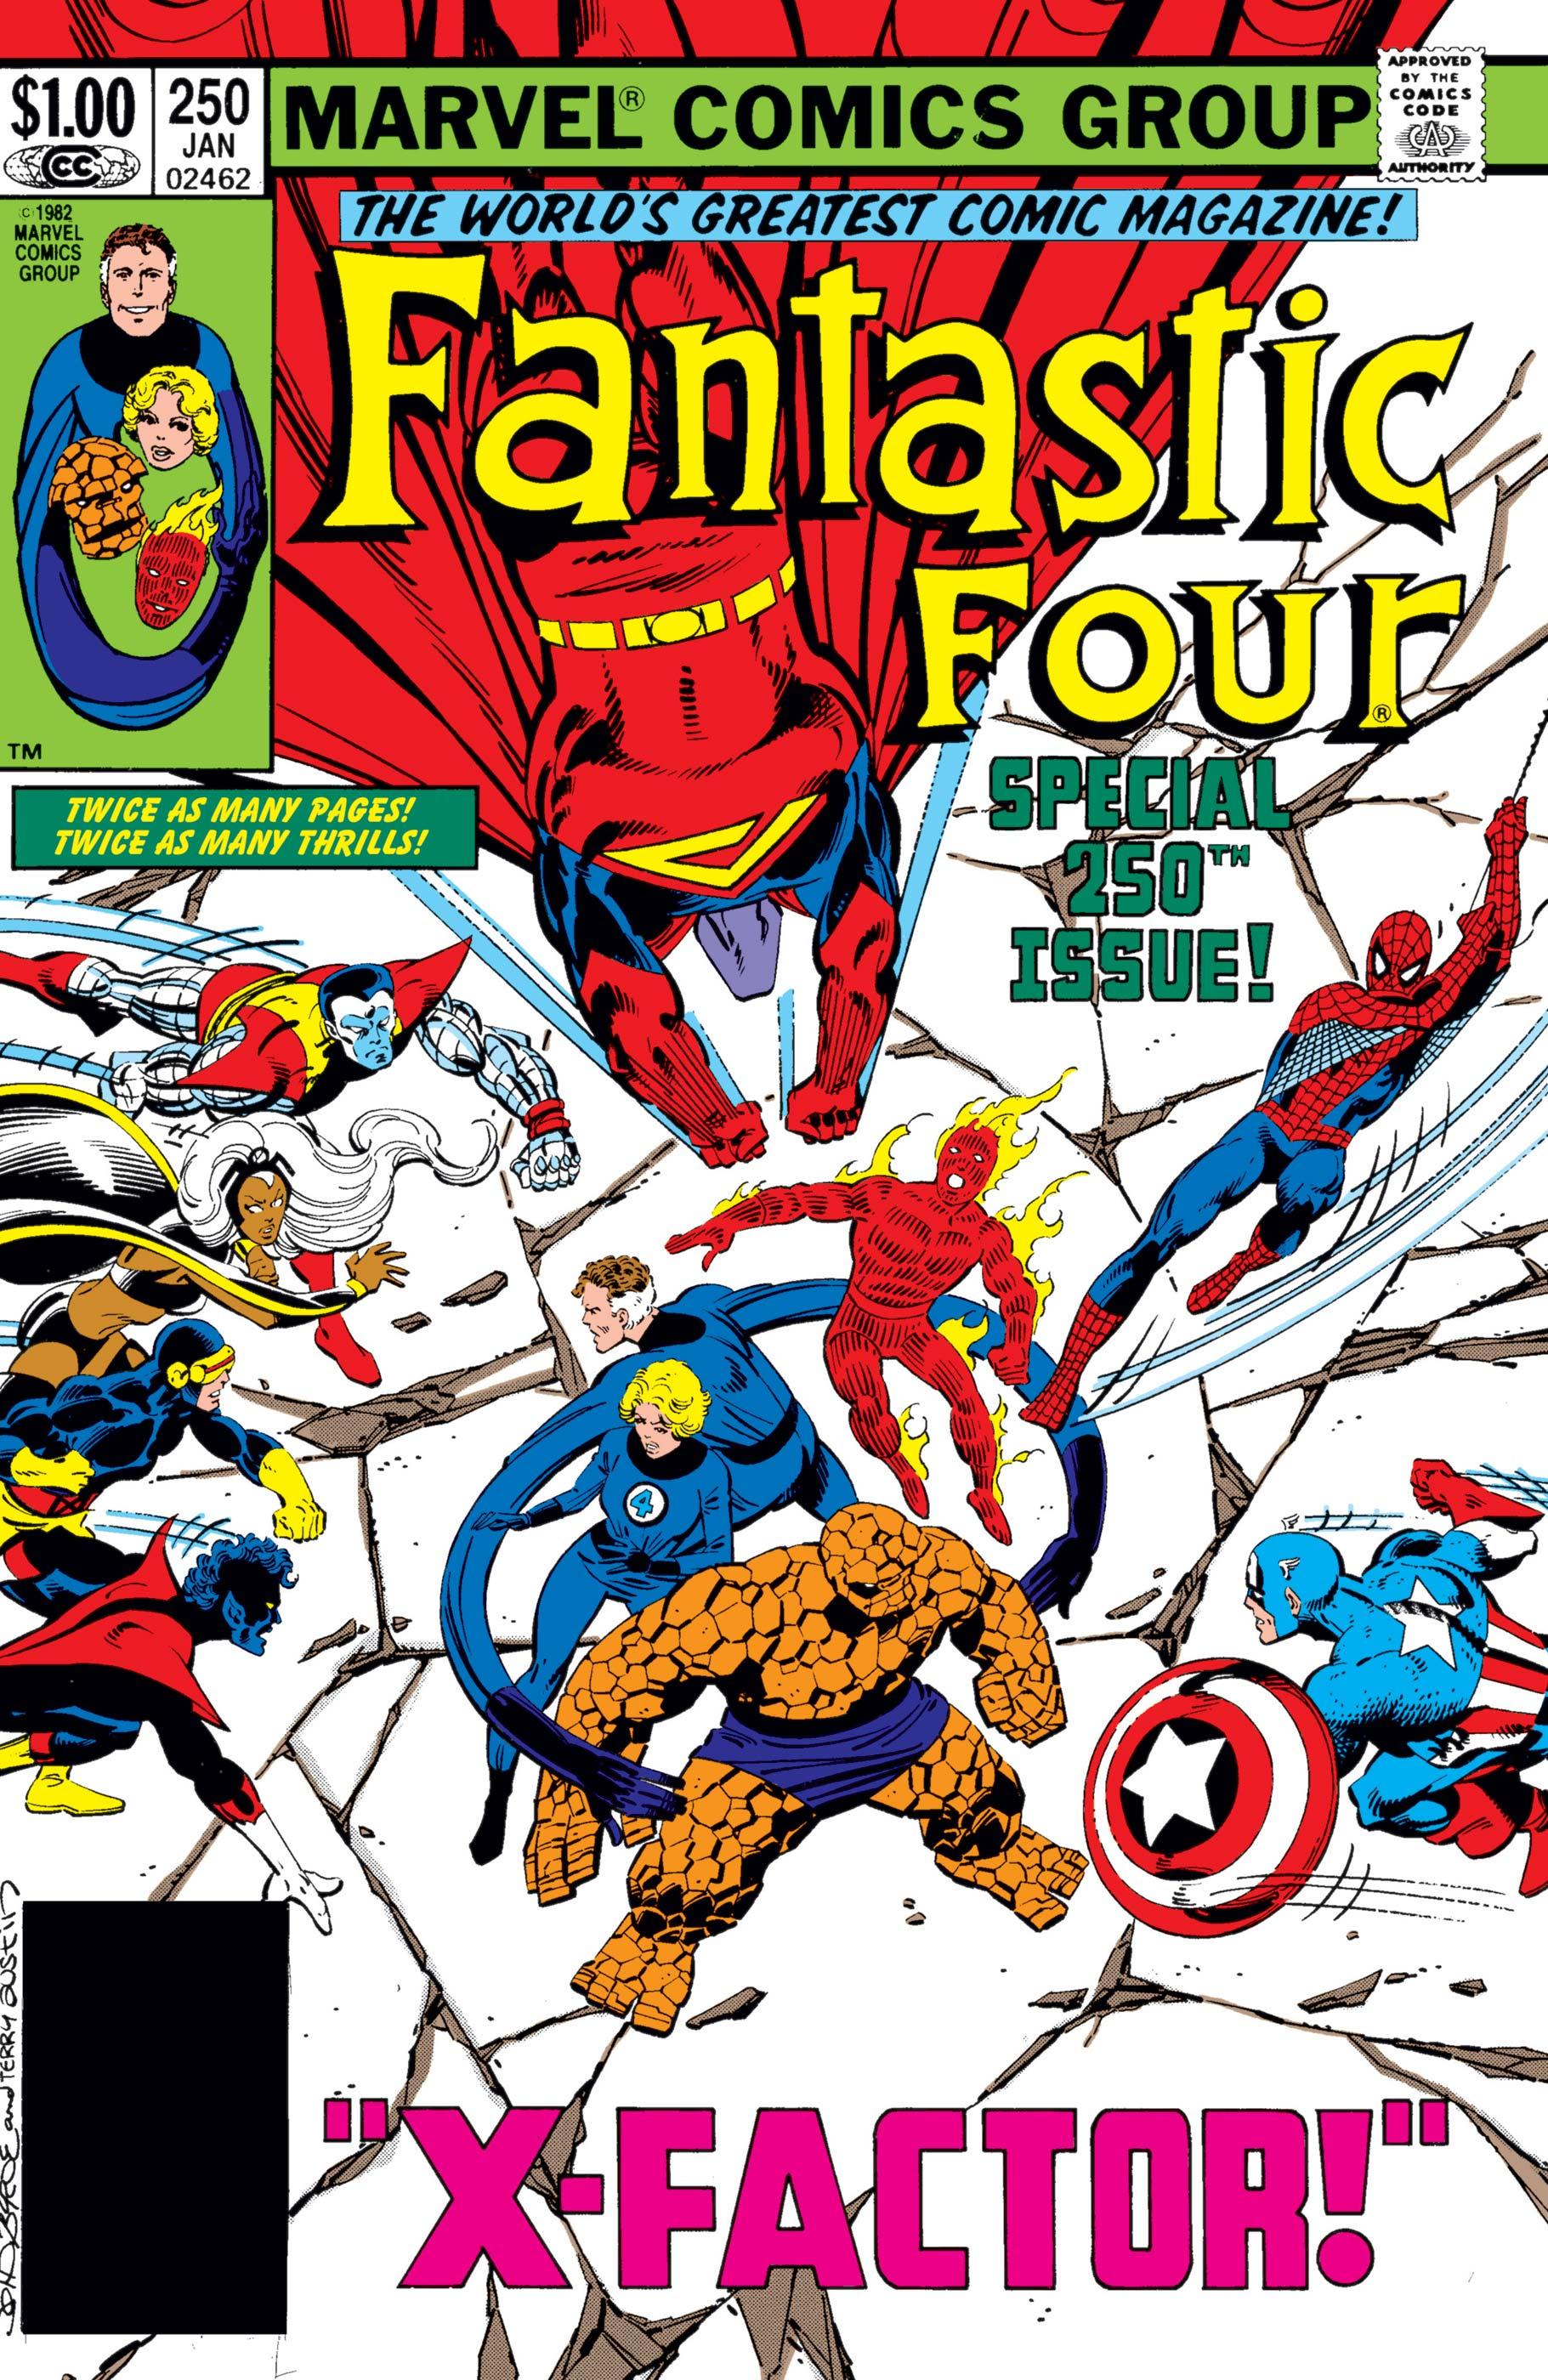 Fantastic Four (1961) #250